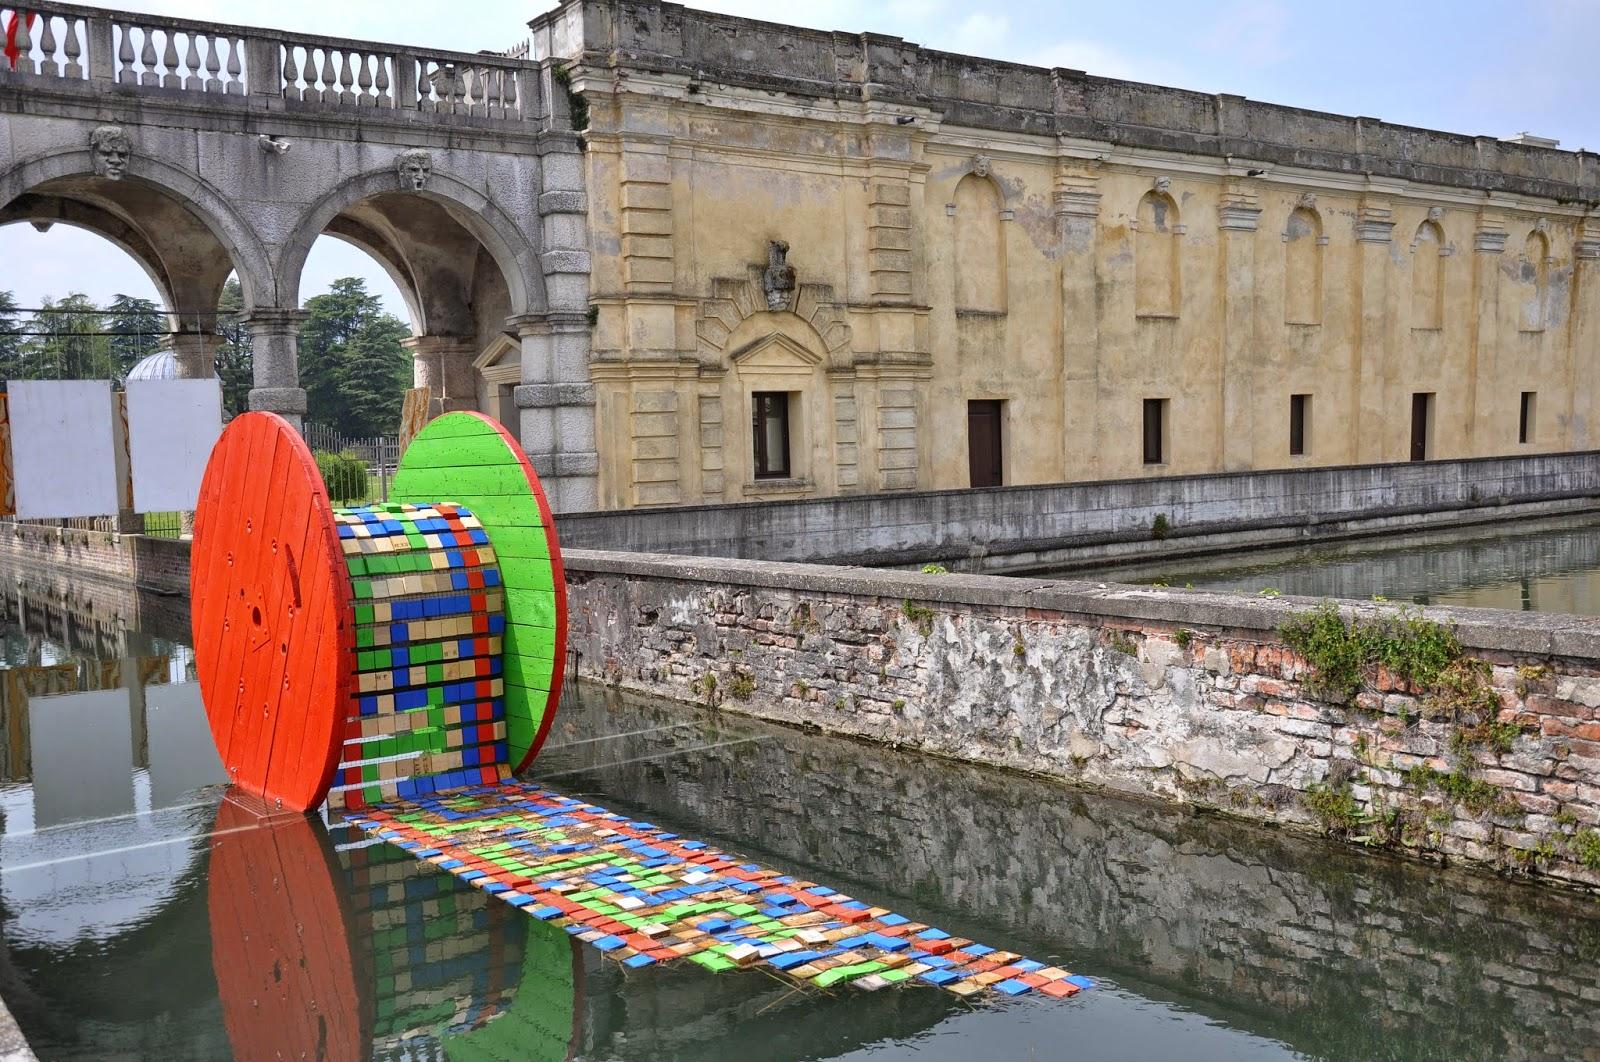 Eloisa Gobbo, Unita di Strada, Villa Contarini modern art exhibition, Piazzola sul Brenta, Veneto, Italy